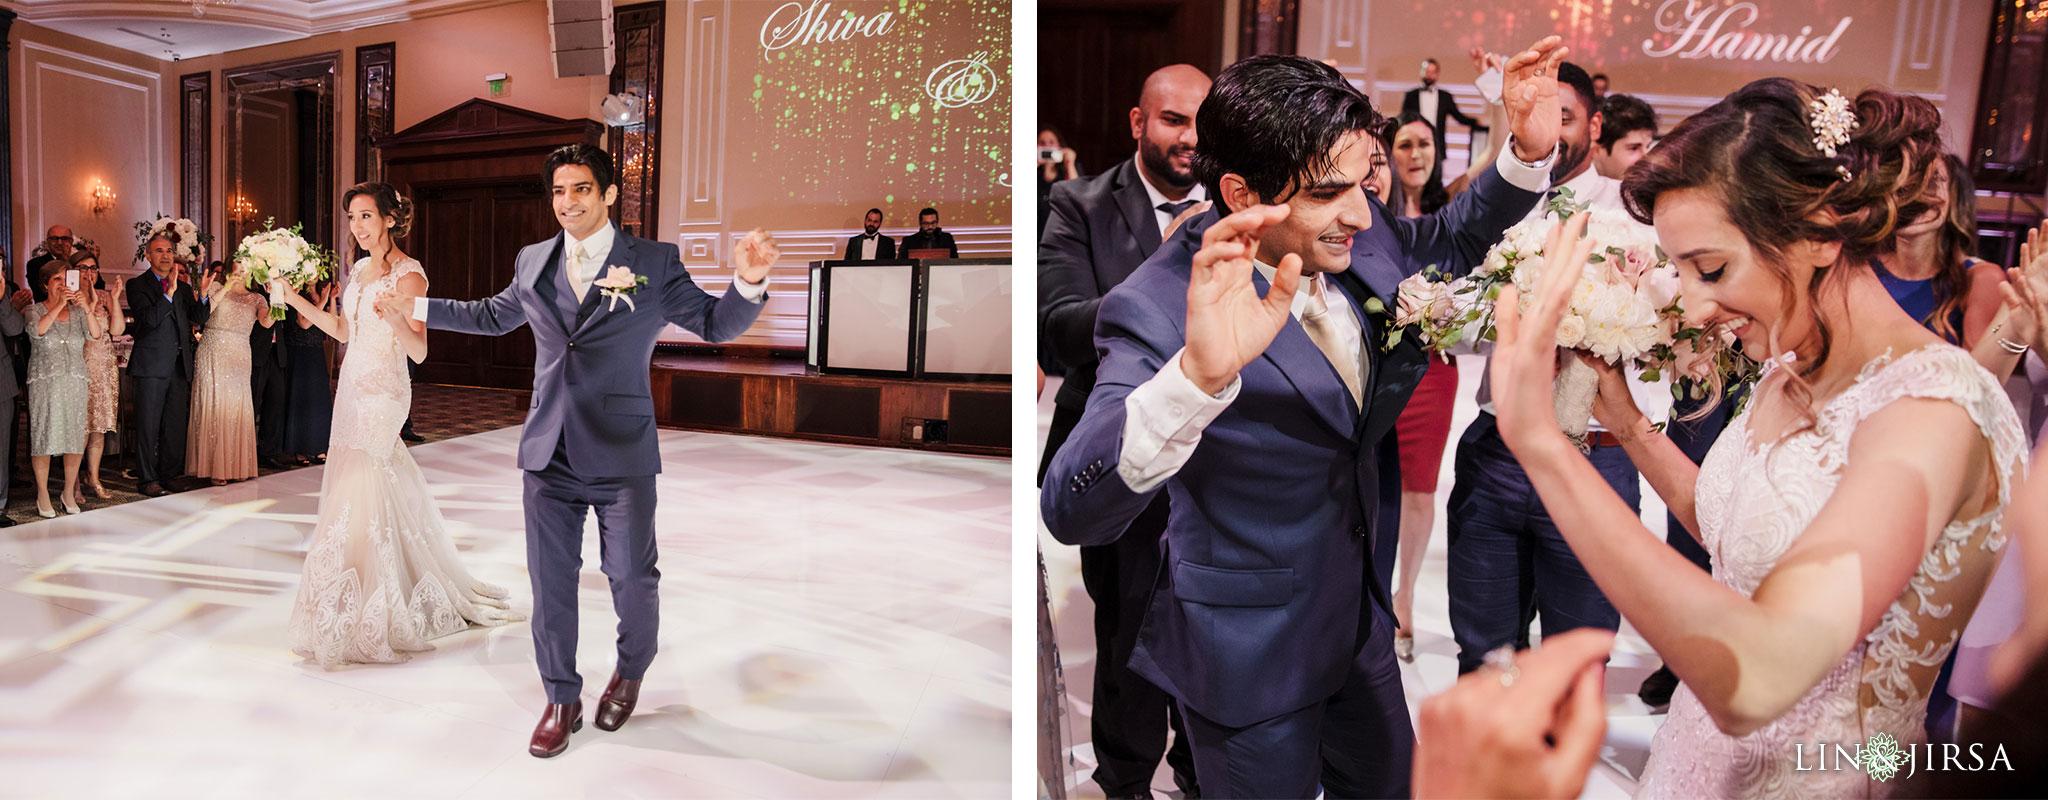 025 taglyan complex los angeles persian wedding photography